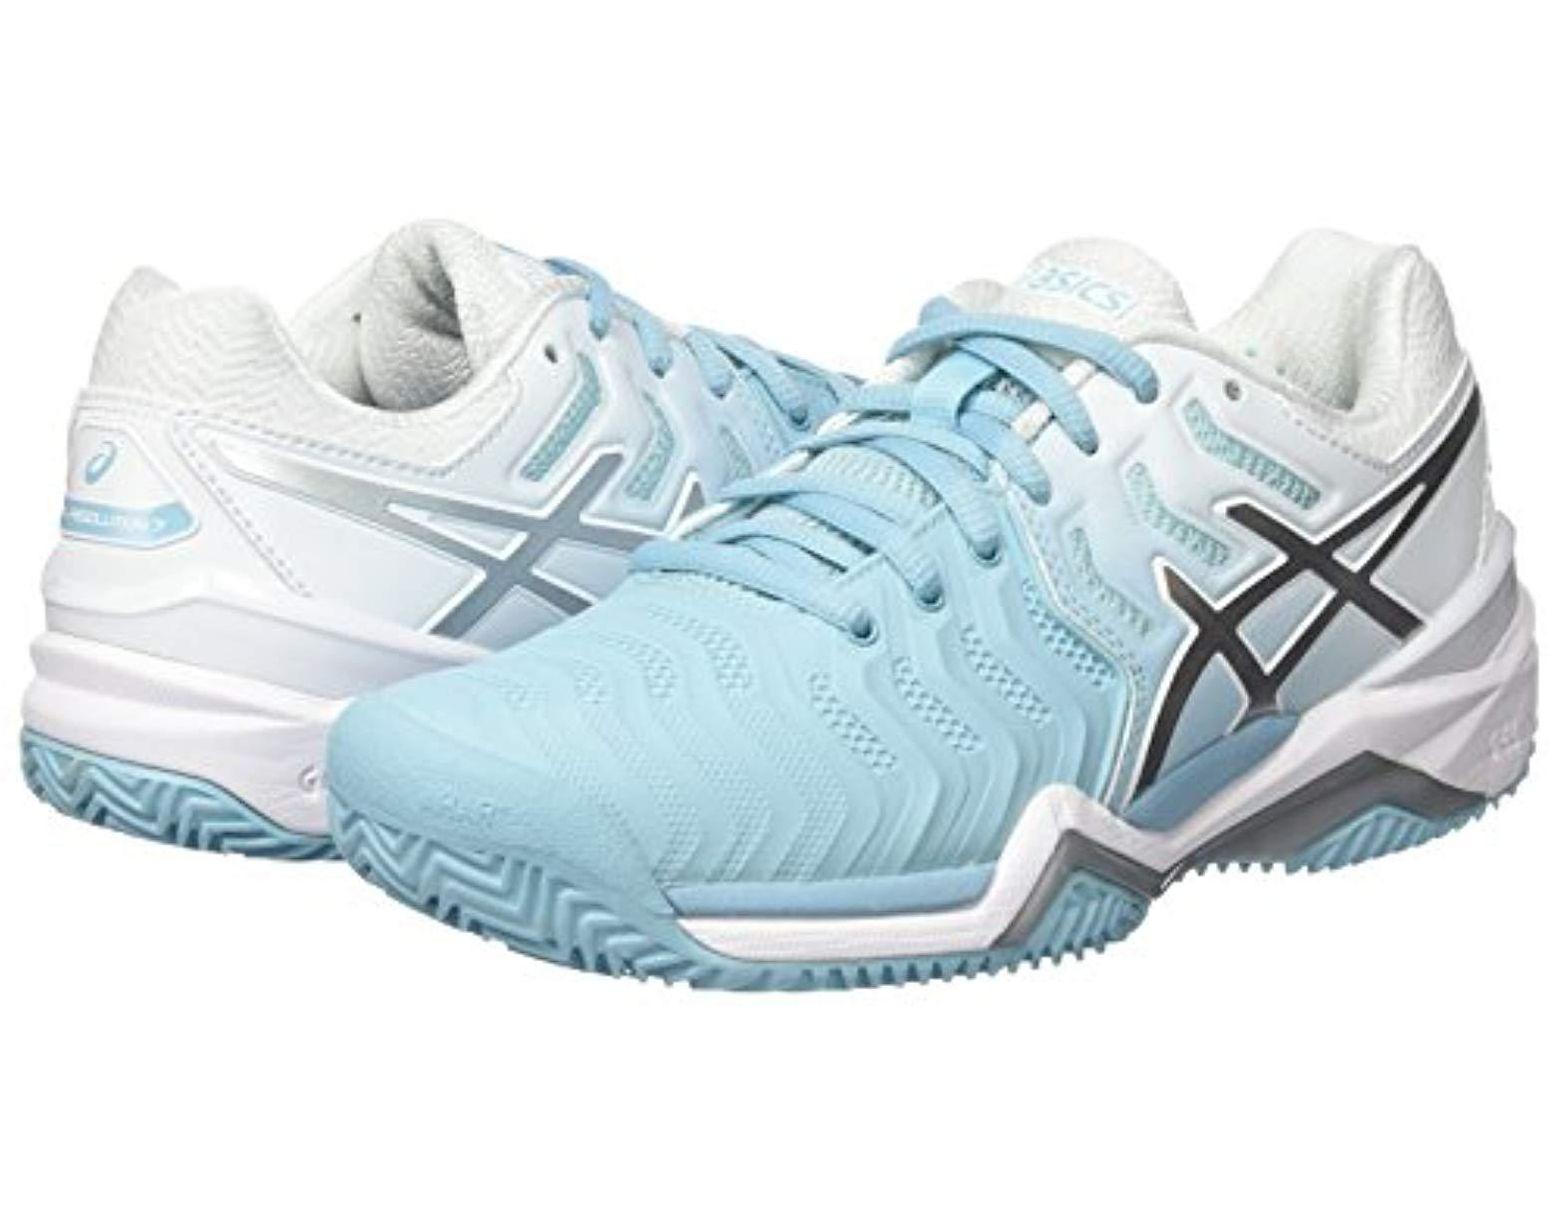 Women's Blue Gel resolution 7 Clay Tennis Shoes